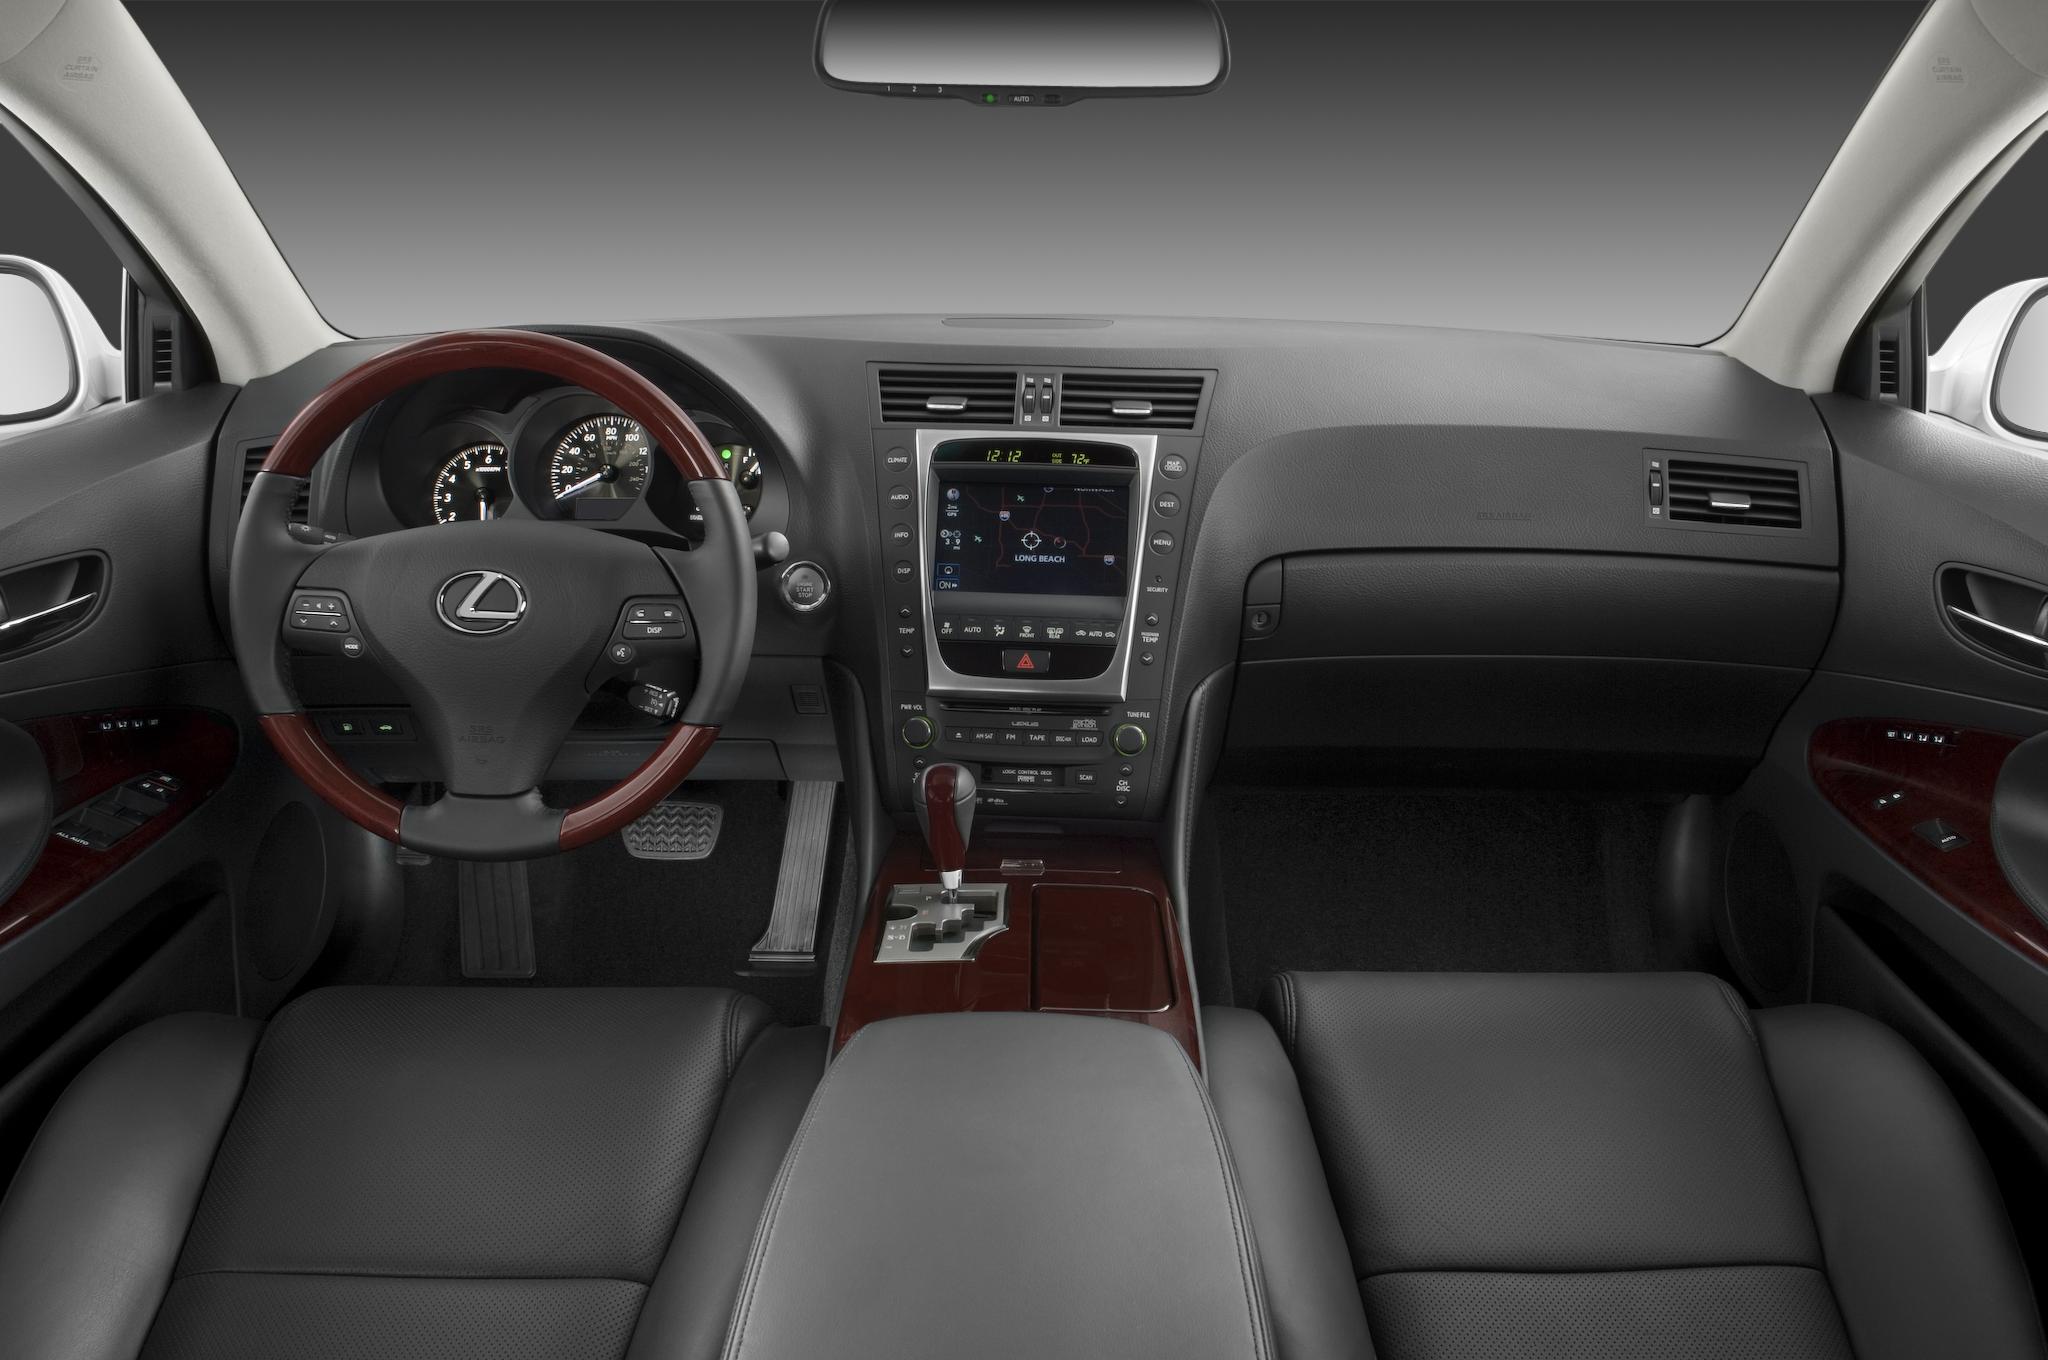 http://st.automobilemag.com/uploads/sites/10/2015/11/2010-lexus-gs-460-sedan-dashboard.png